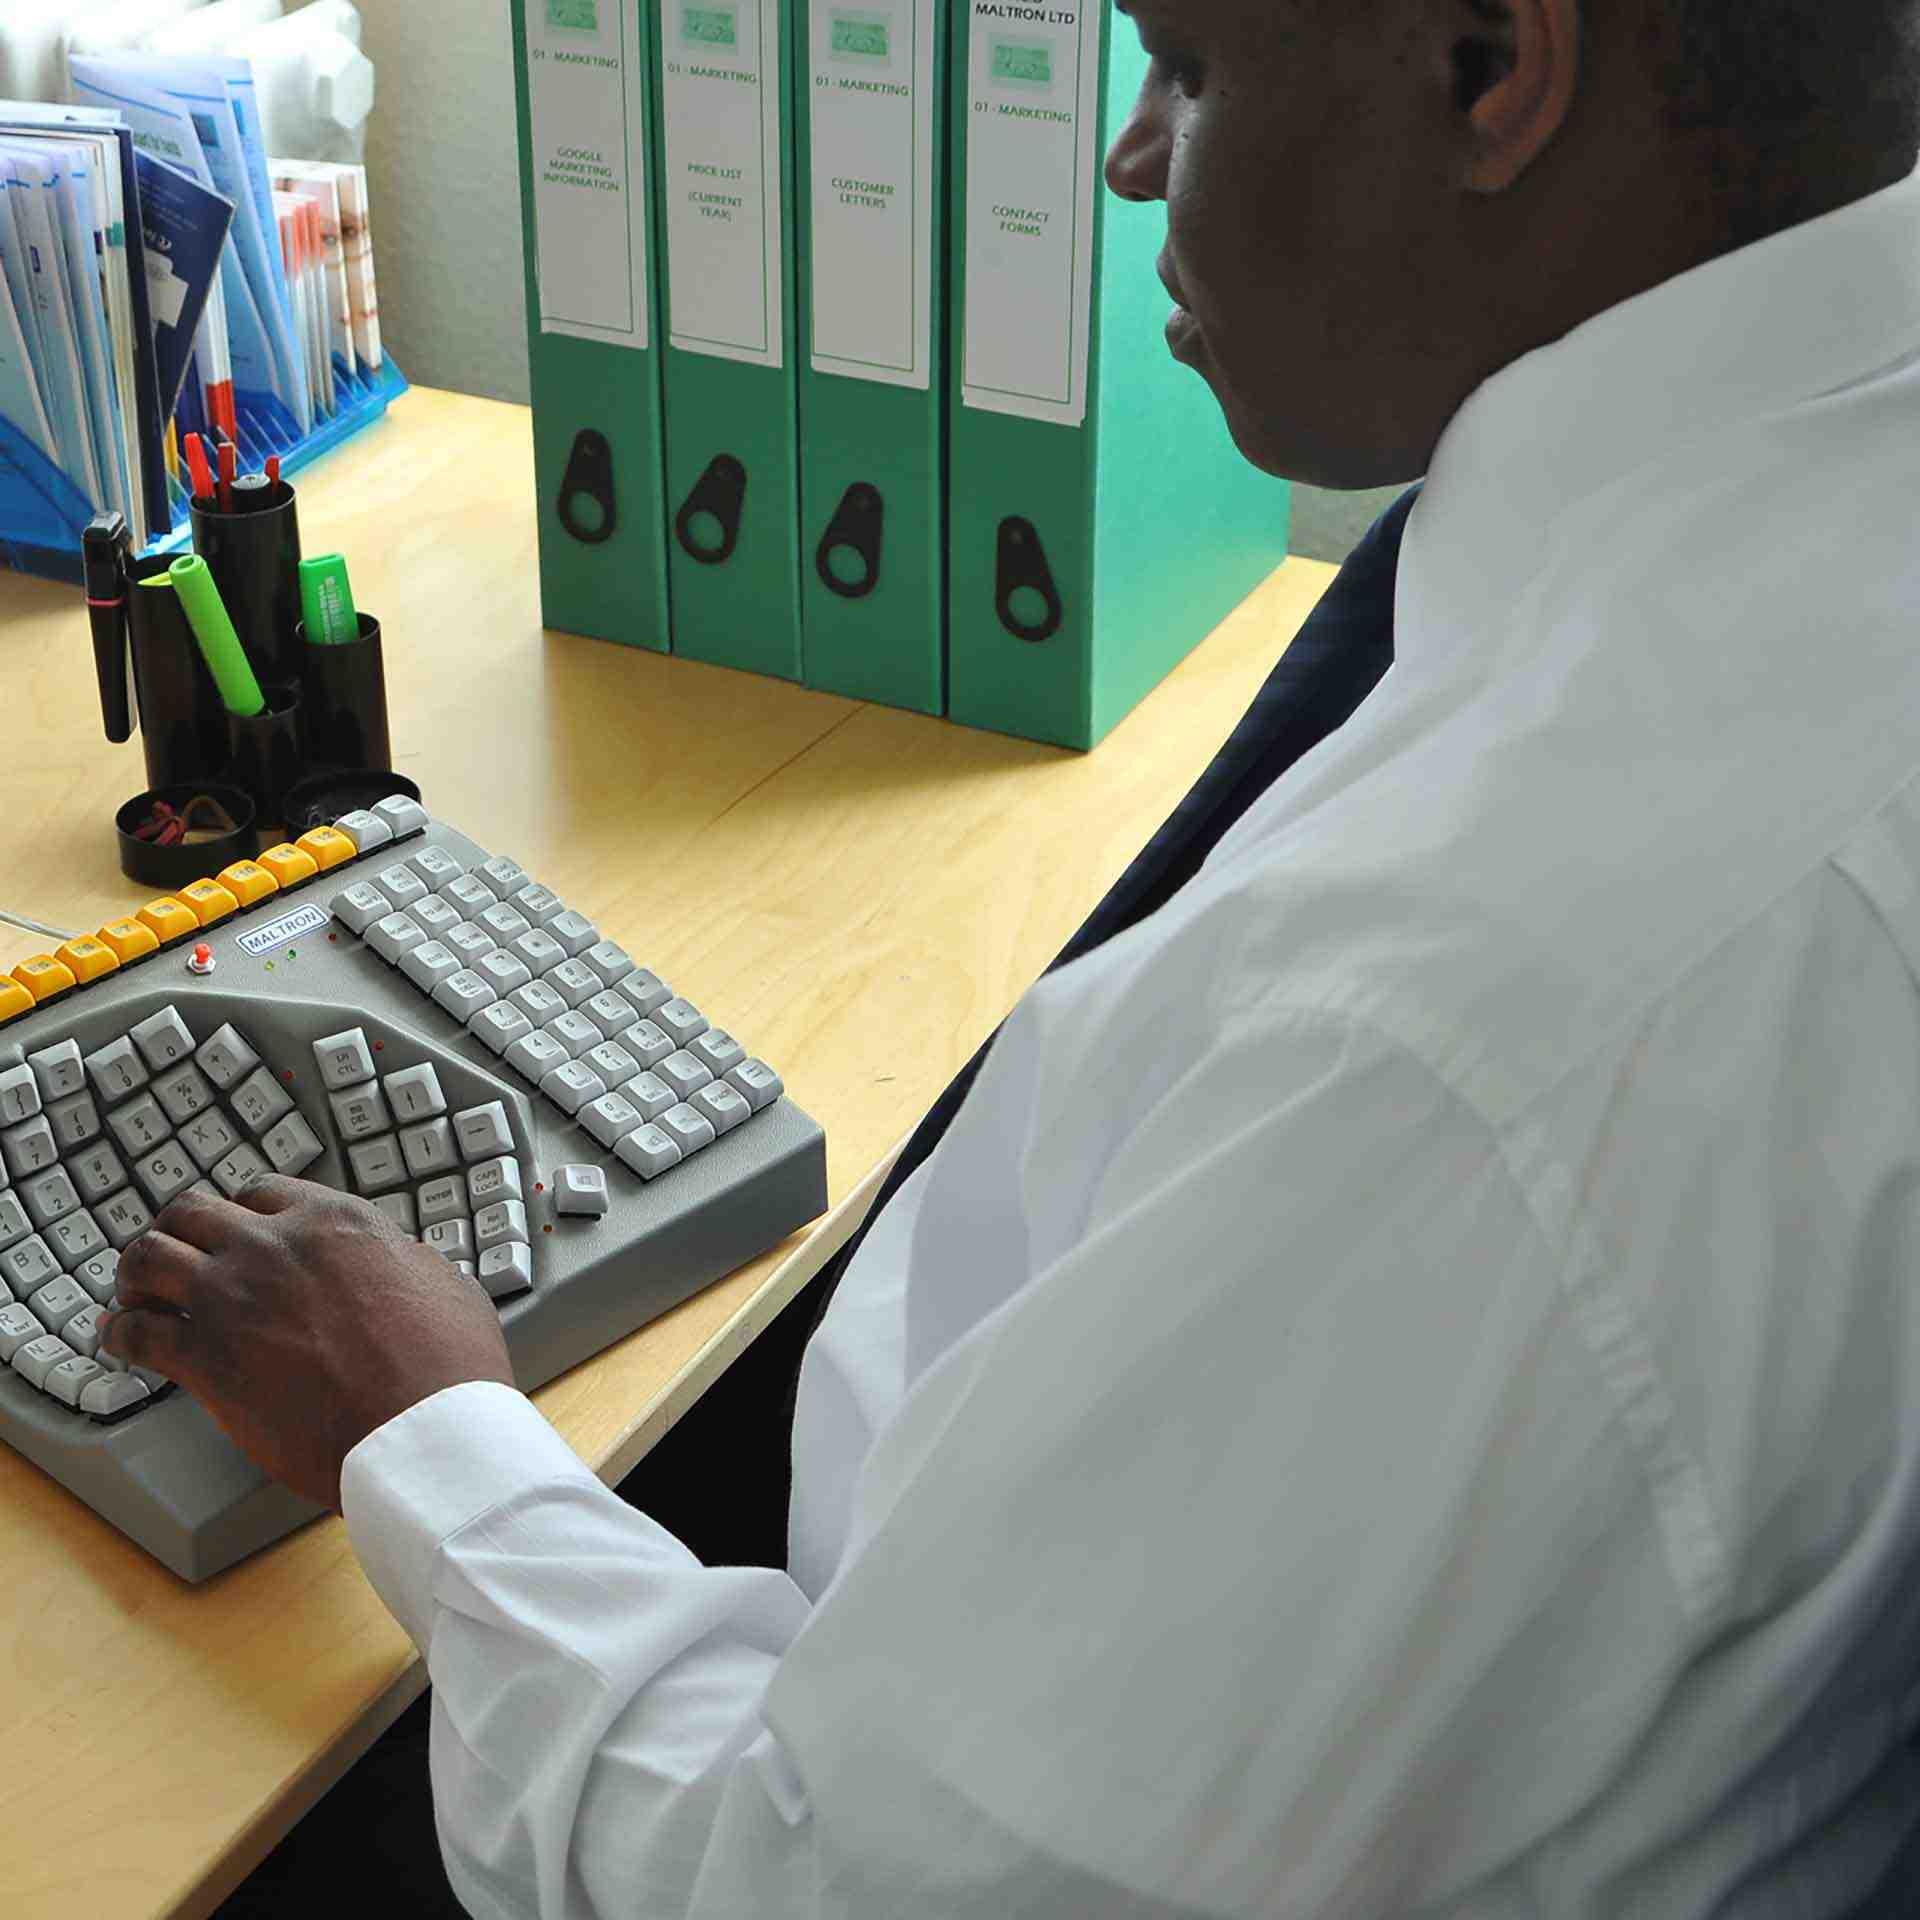 Maltron linkshandig toetsenbord ERKAMAL01 0005s 0004 Omgeving